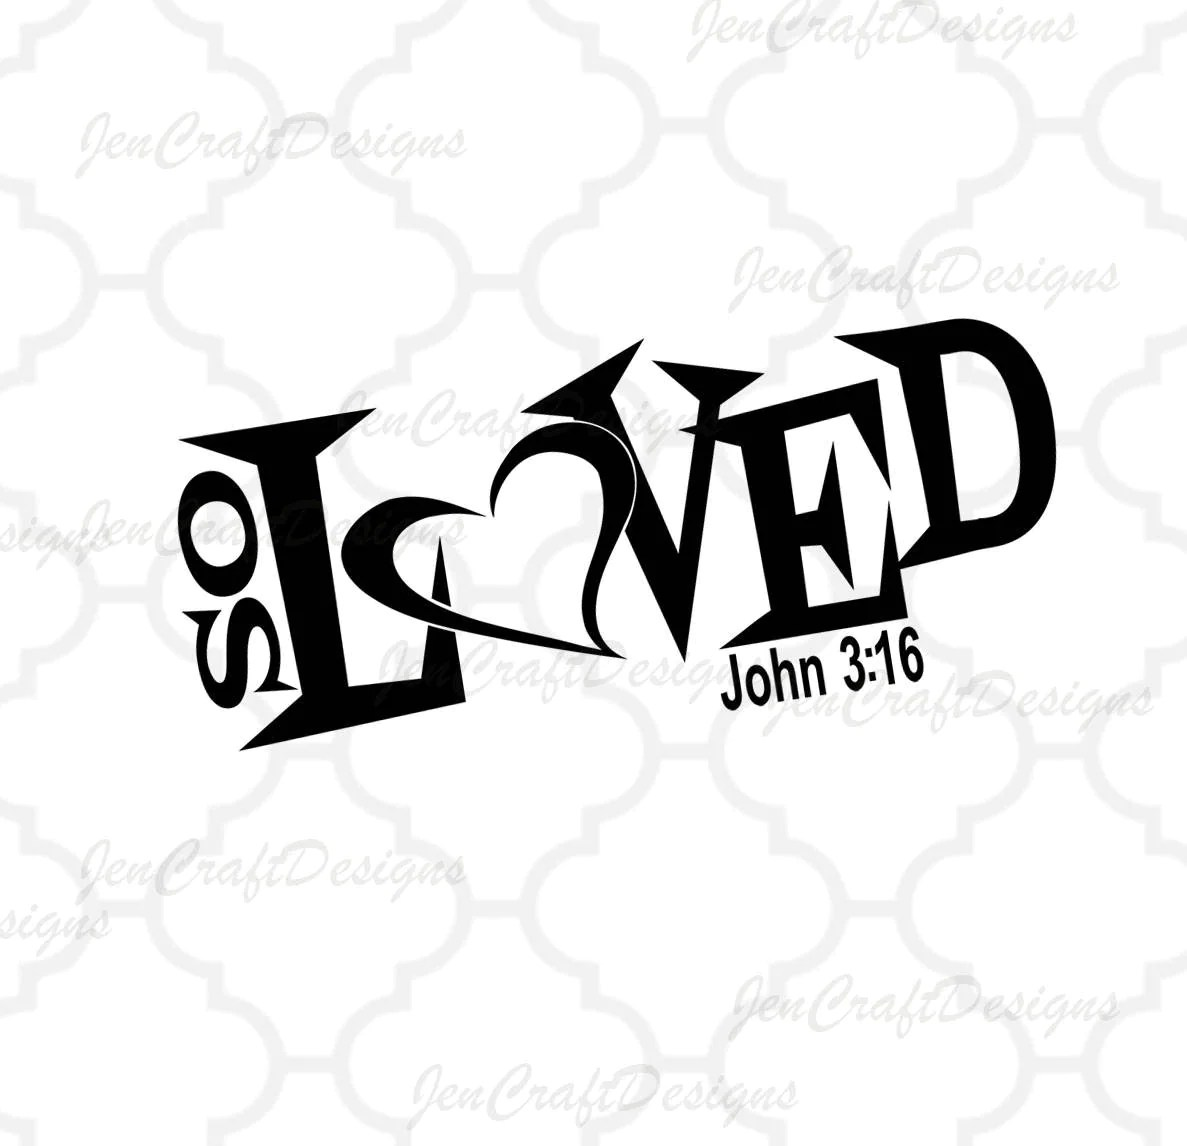 So Loved Svg Christian Svg John 3 16 Svg 3 16 Valentine